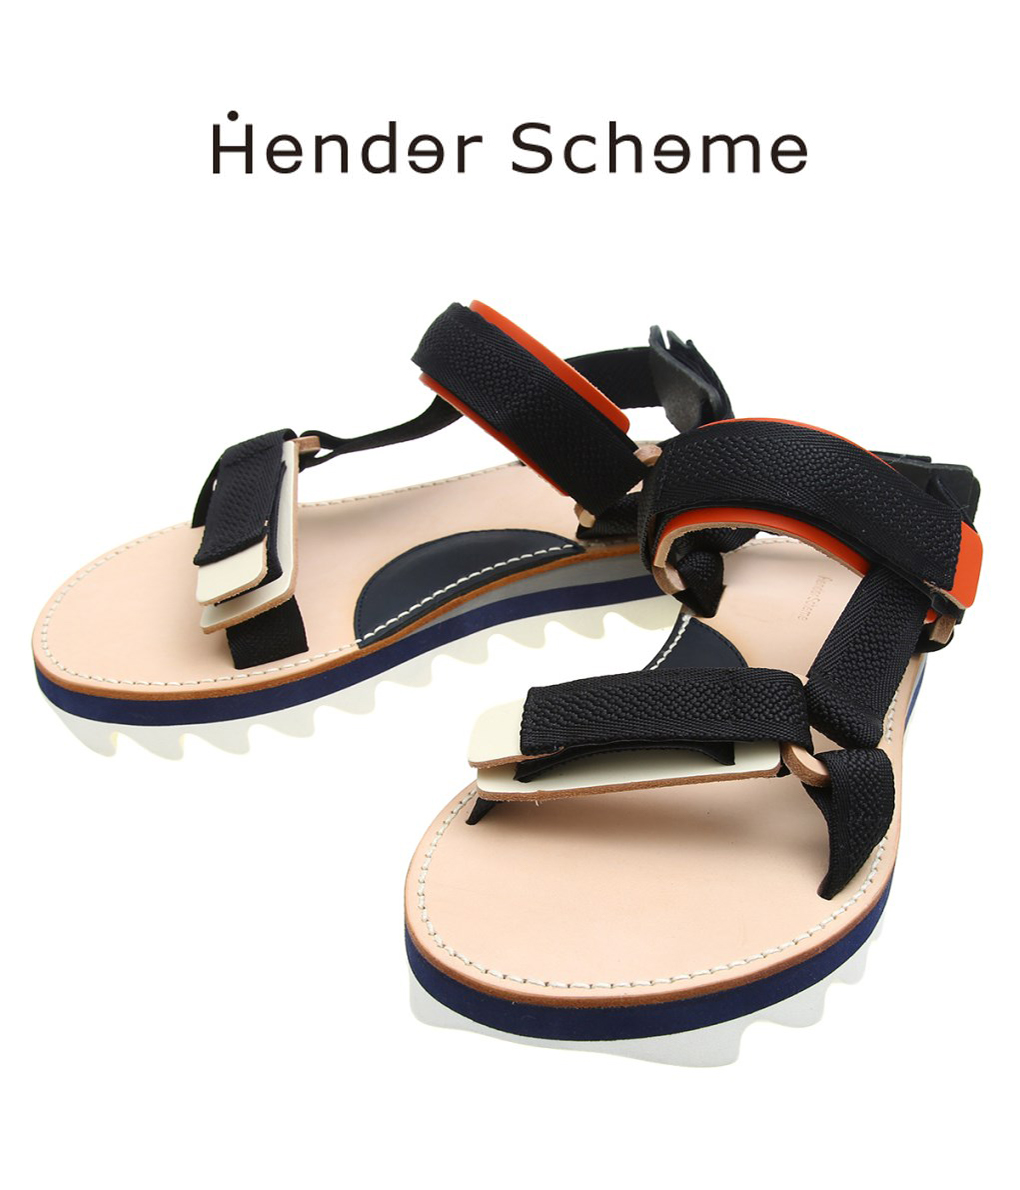 Hender Scheme / エンダースキーマ : webb: ウェブ レザーサンダル サンダル メンズ サンダル シューズ : bs-rs-web 【RIP】